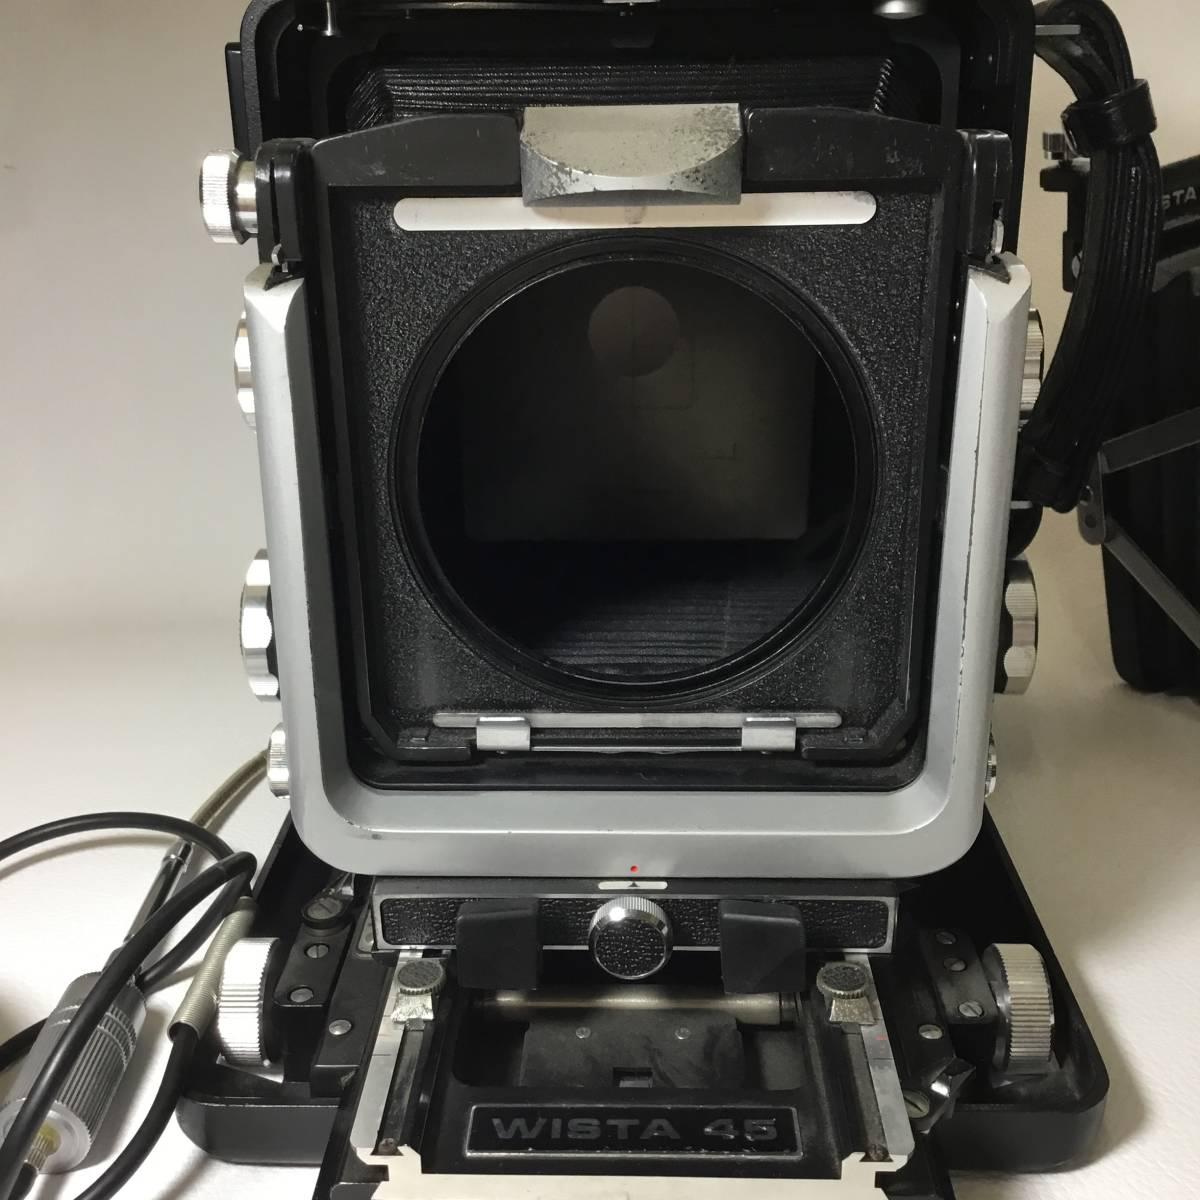 WISTA 45 ウィスタ45 レンズ 付属品セット 大判カメラ_画像2